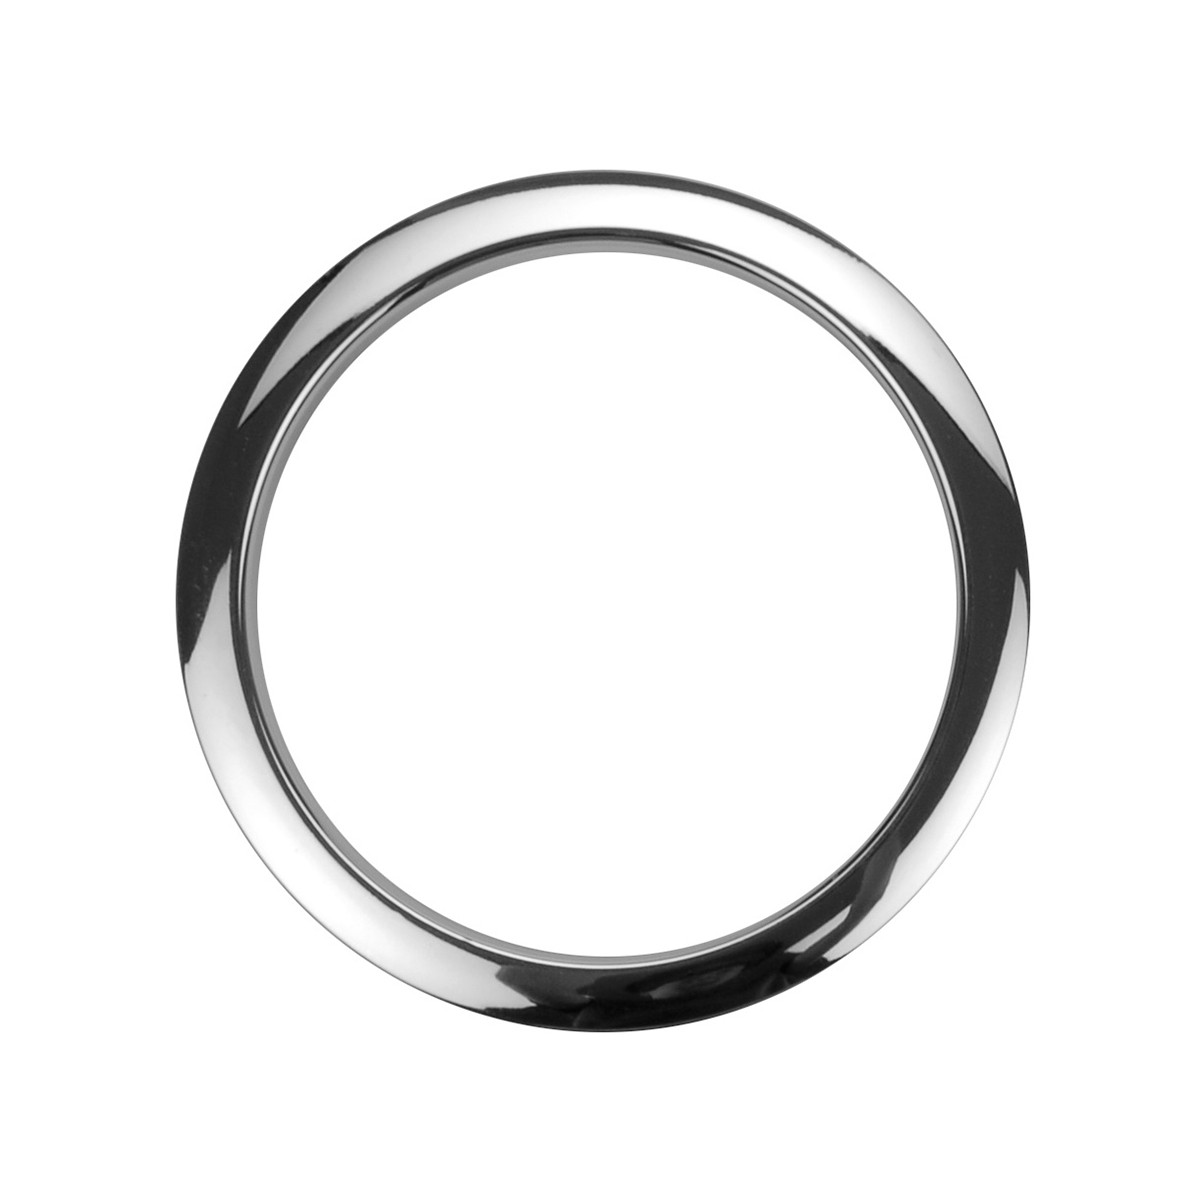 "HC5 - Anneau de Renfort 5"" Chrome"